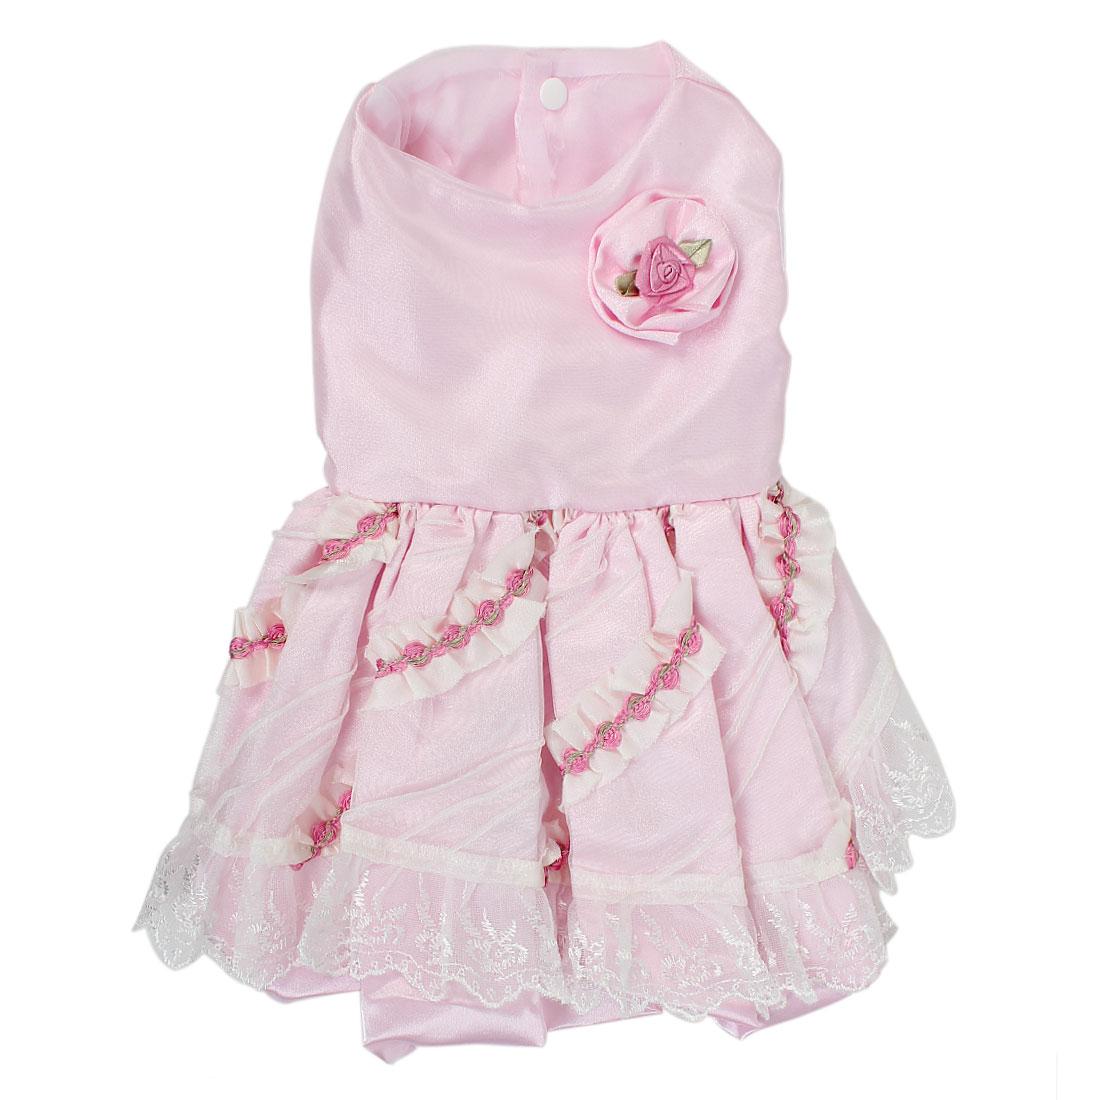 Pet Dog Doggie Rose Lace Decor Princess Wedding Dress Skirt Pink Size XS